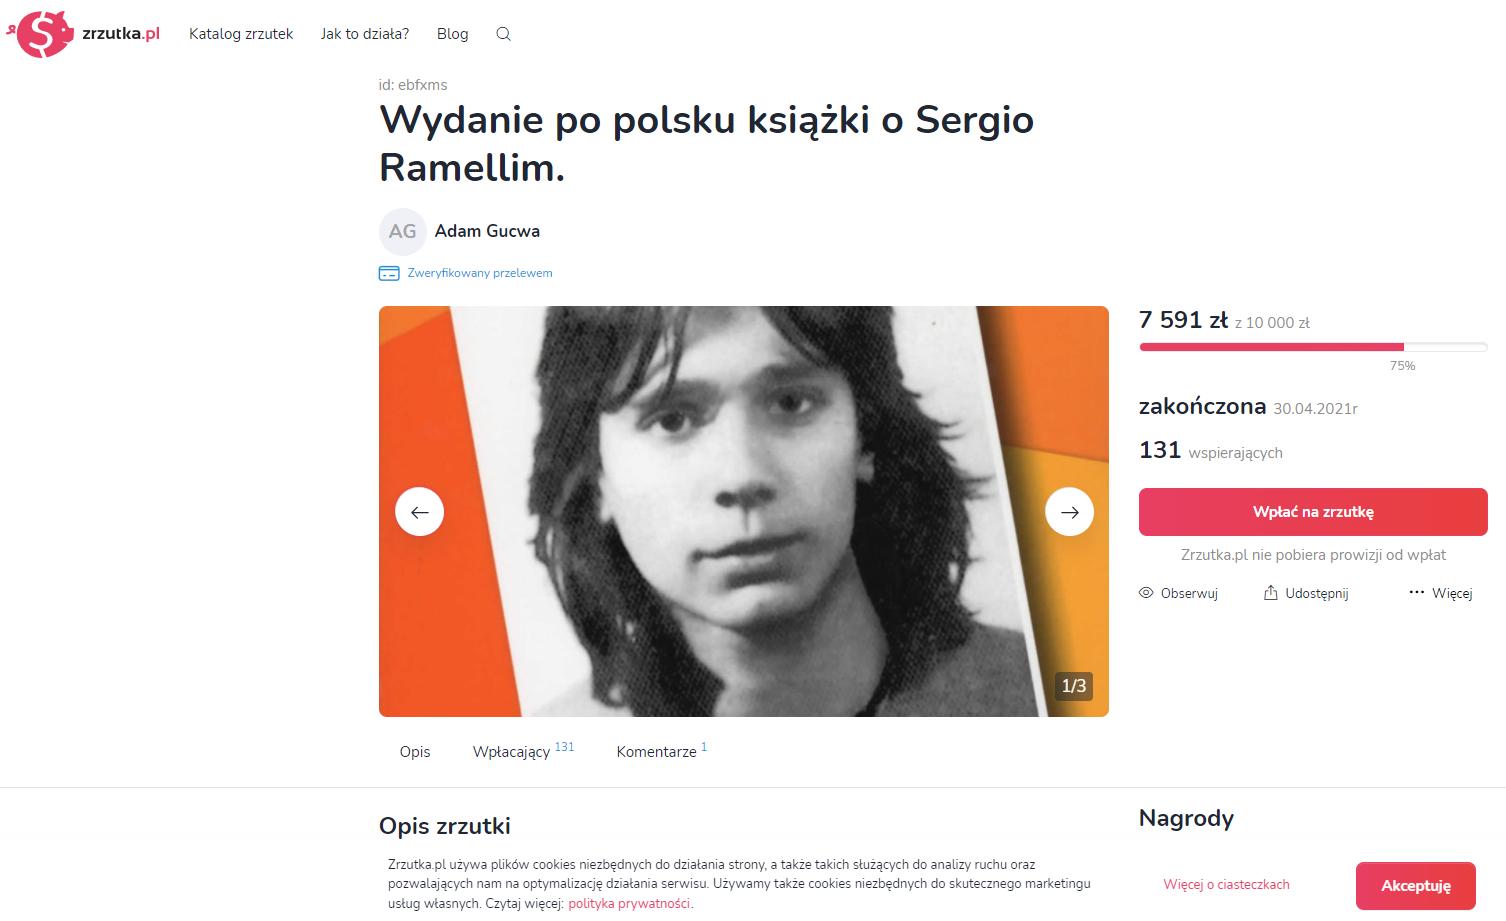 Raccolta fondi pololonia